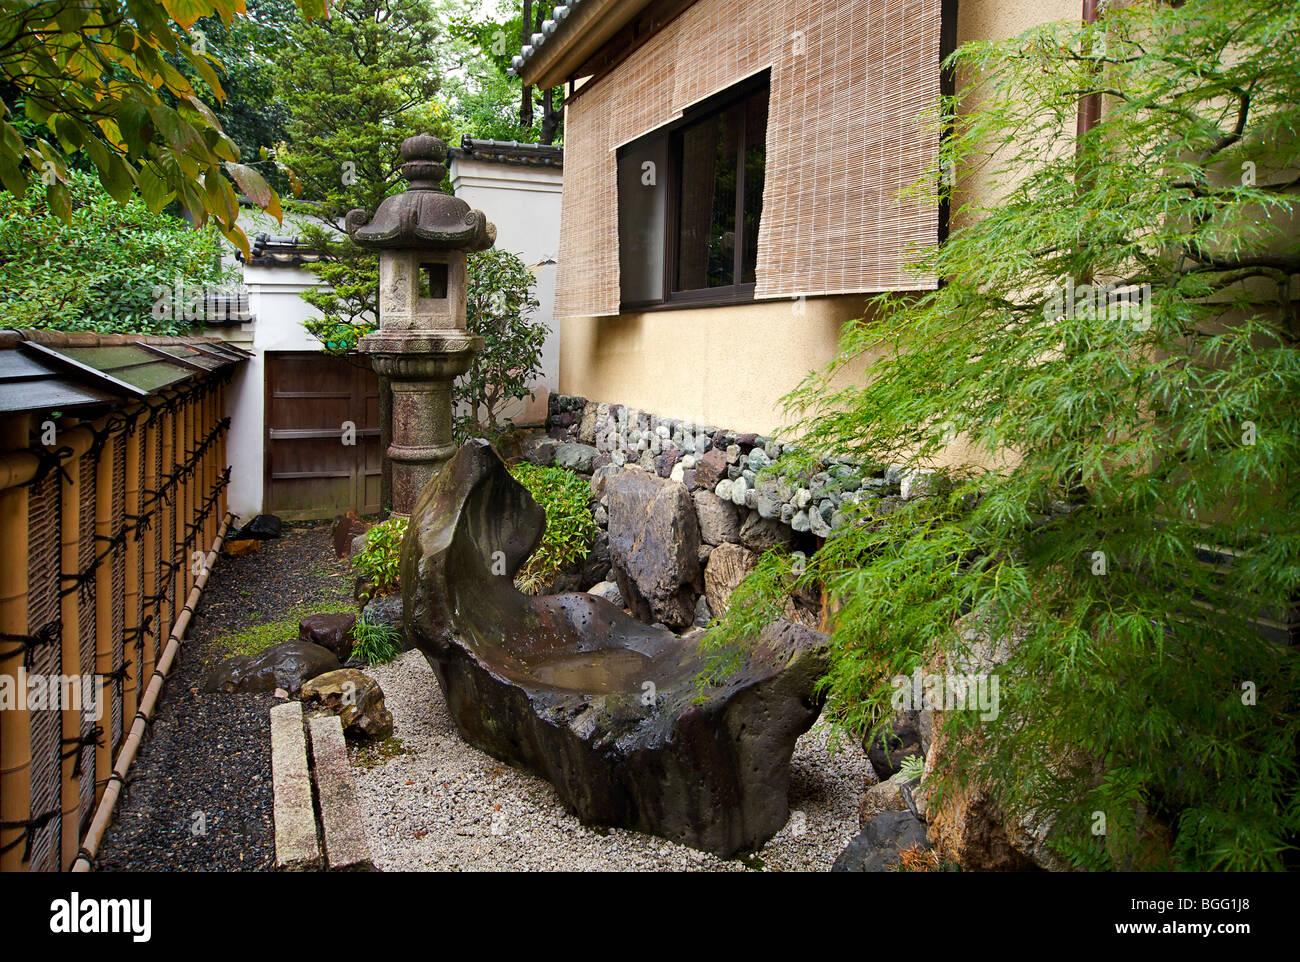 Gion Hatanaka. Japanese ryokan.  Garden. A traditional style guest house. Kyoto, Japan - Stock Image